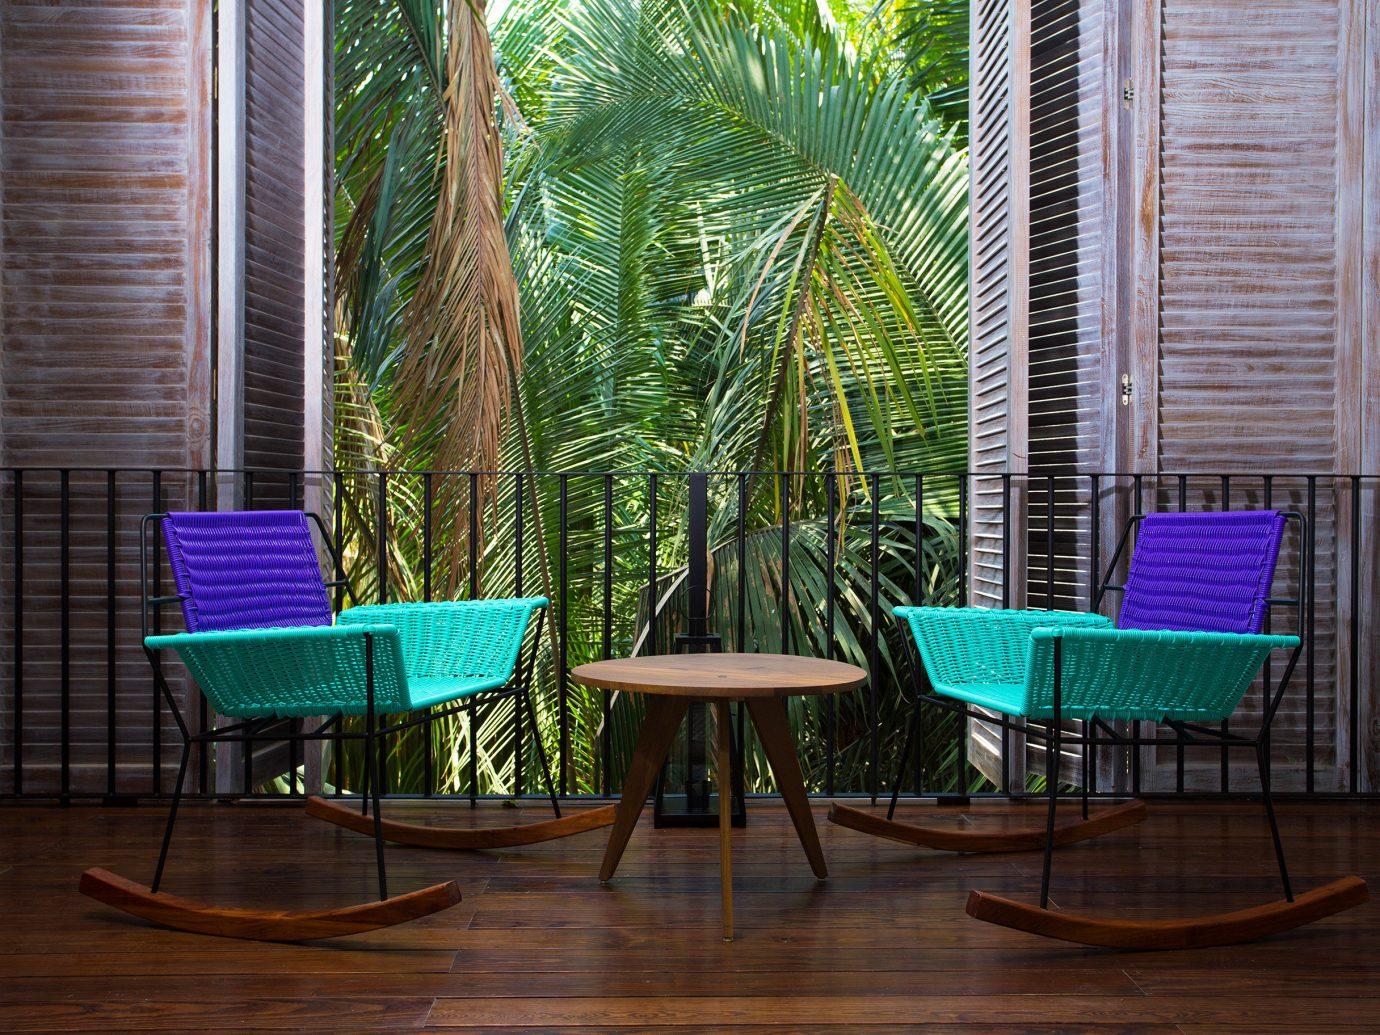 Influencers + Tastemakers Travel Shop Trip Ideas floor chair leisure indoor window room furniture wood interior design table Design backyard outdoor structure area